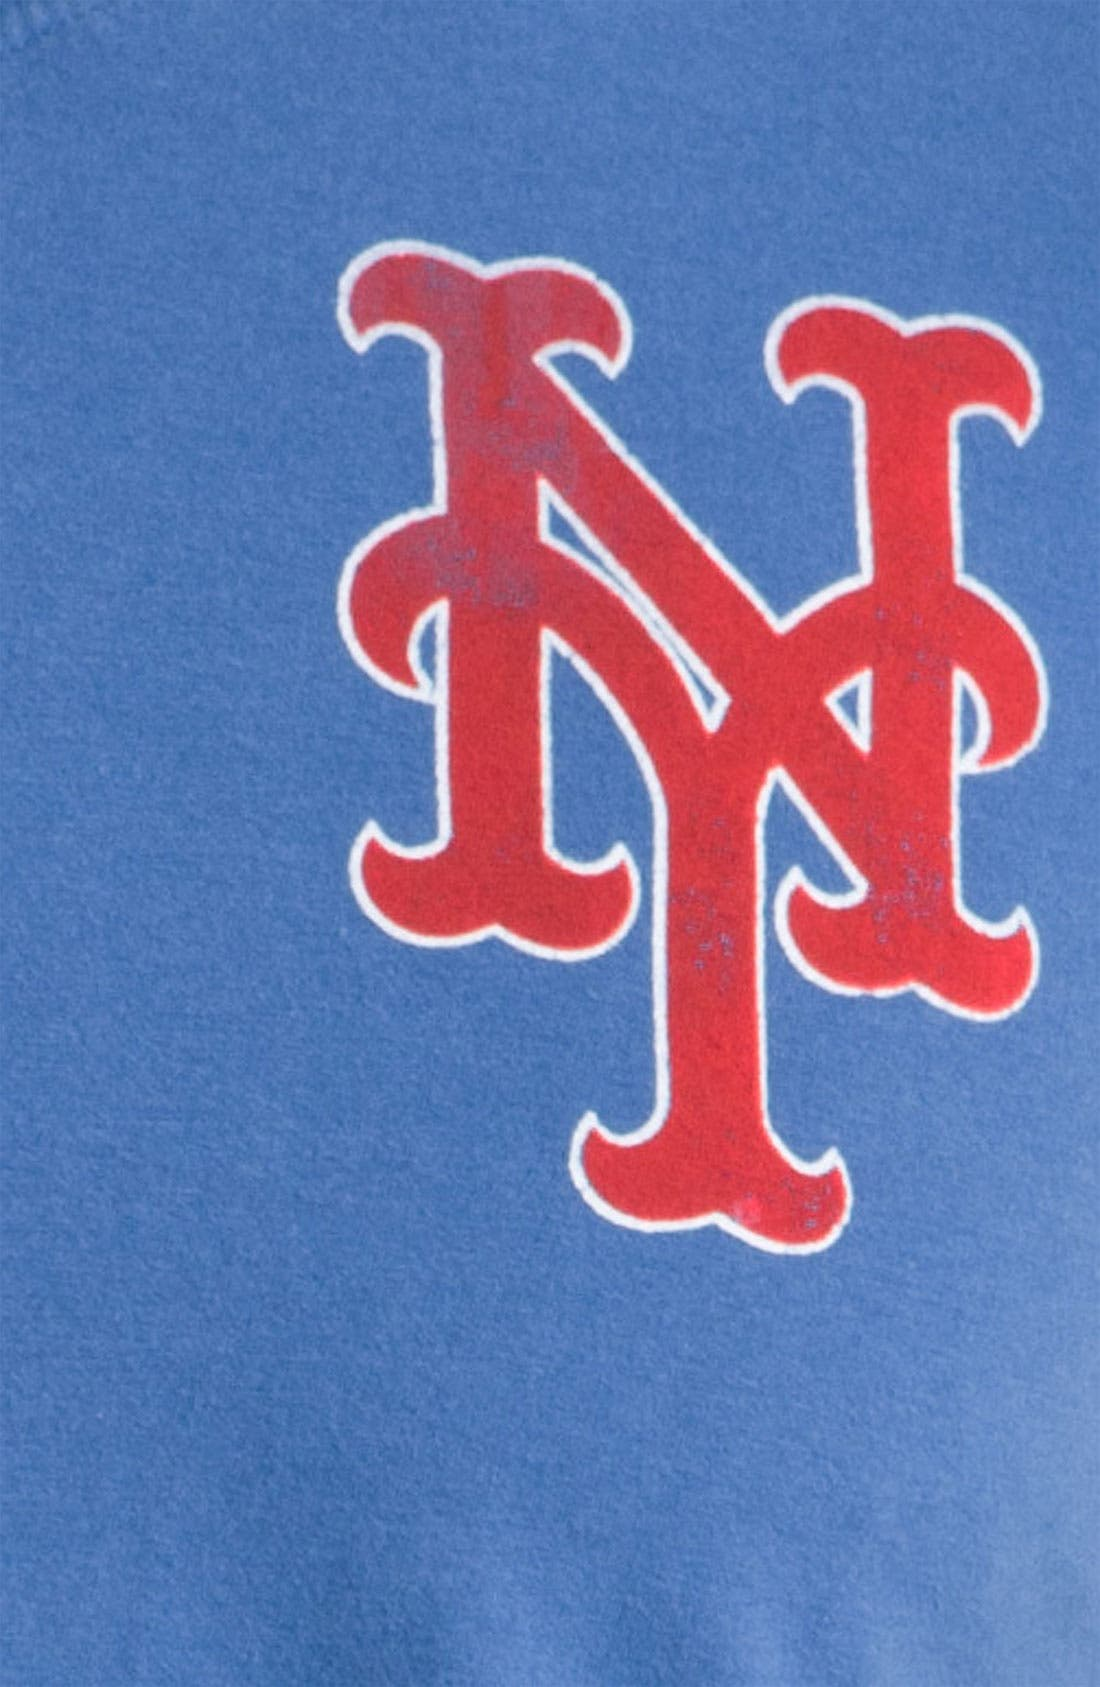 Alternate Image 3  - Red Jacket 'Mets - Huron' T-Shirt